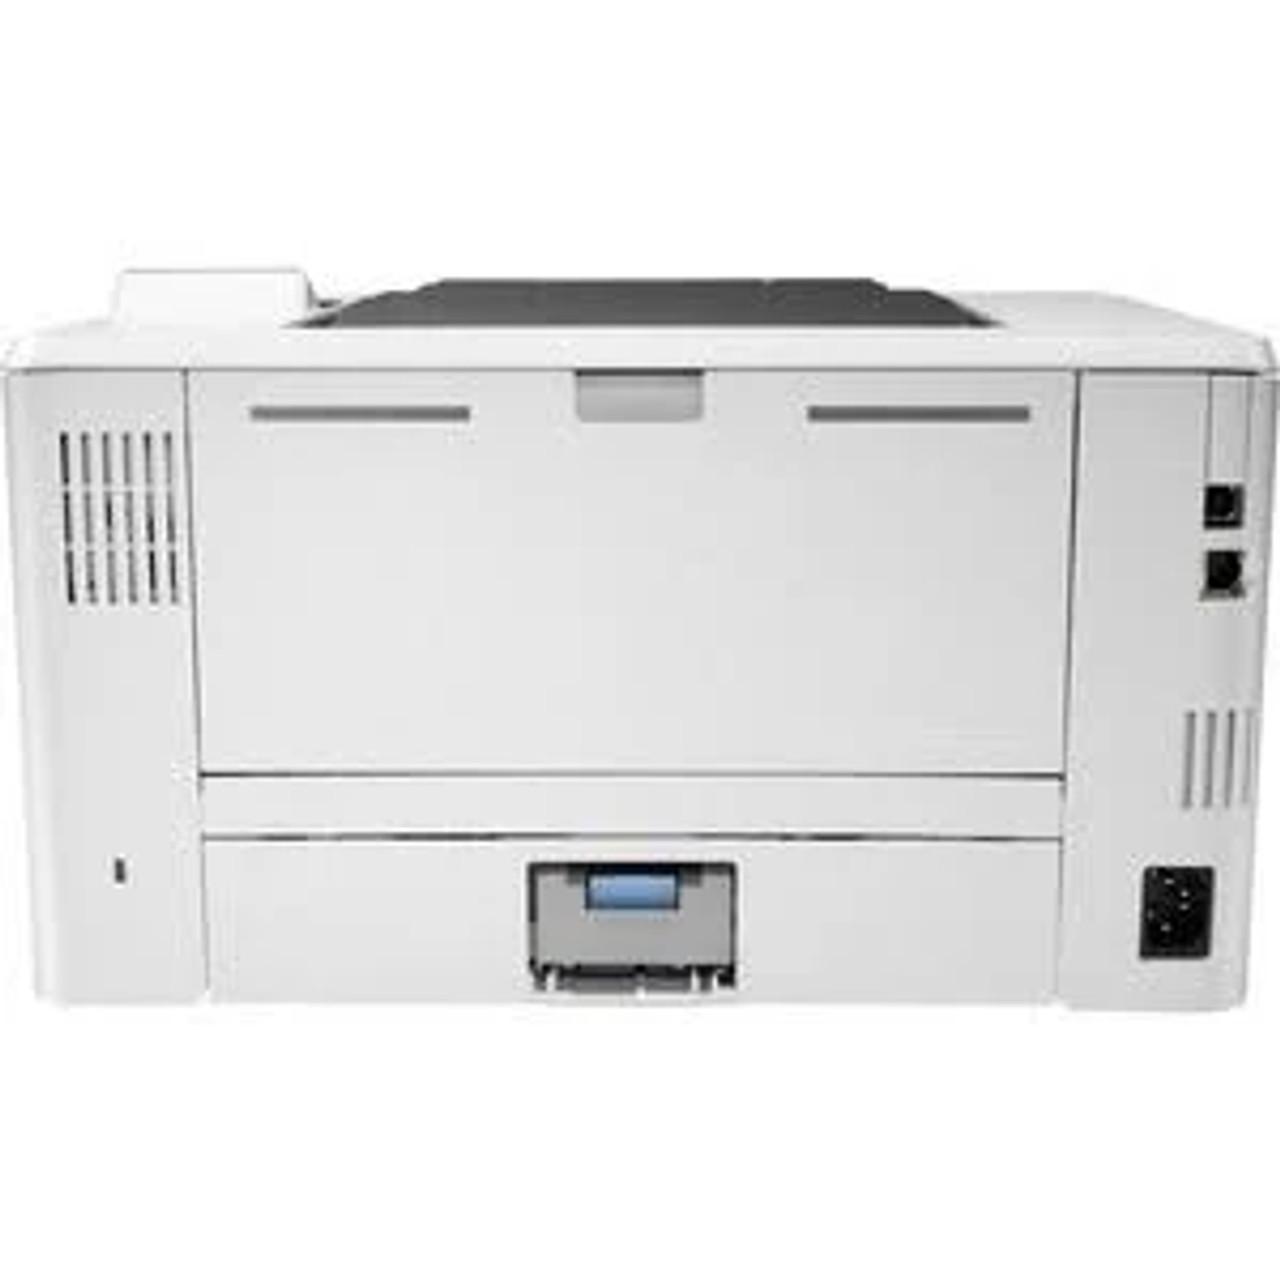 HP LaserJet Pro M404dn Laser Printer with USB and Ethernet